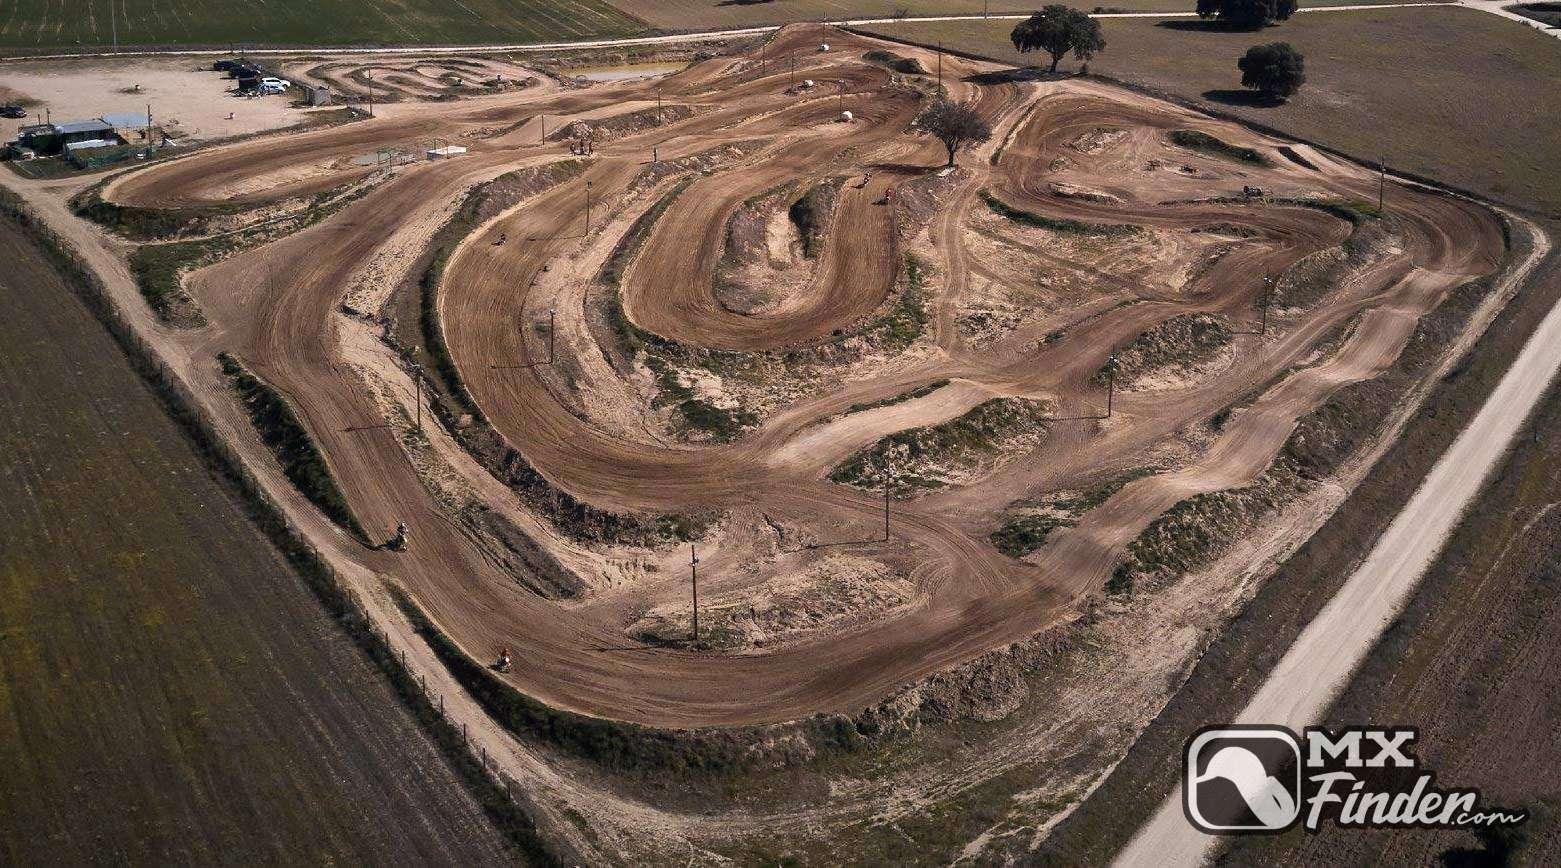 motocross, MX Escalona, Escalona, motocross track